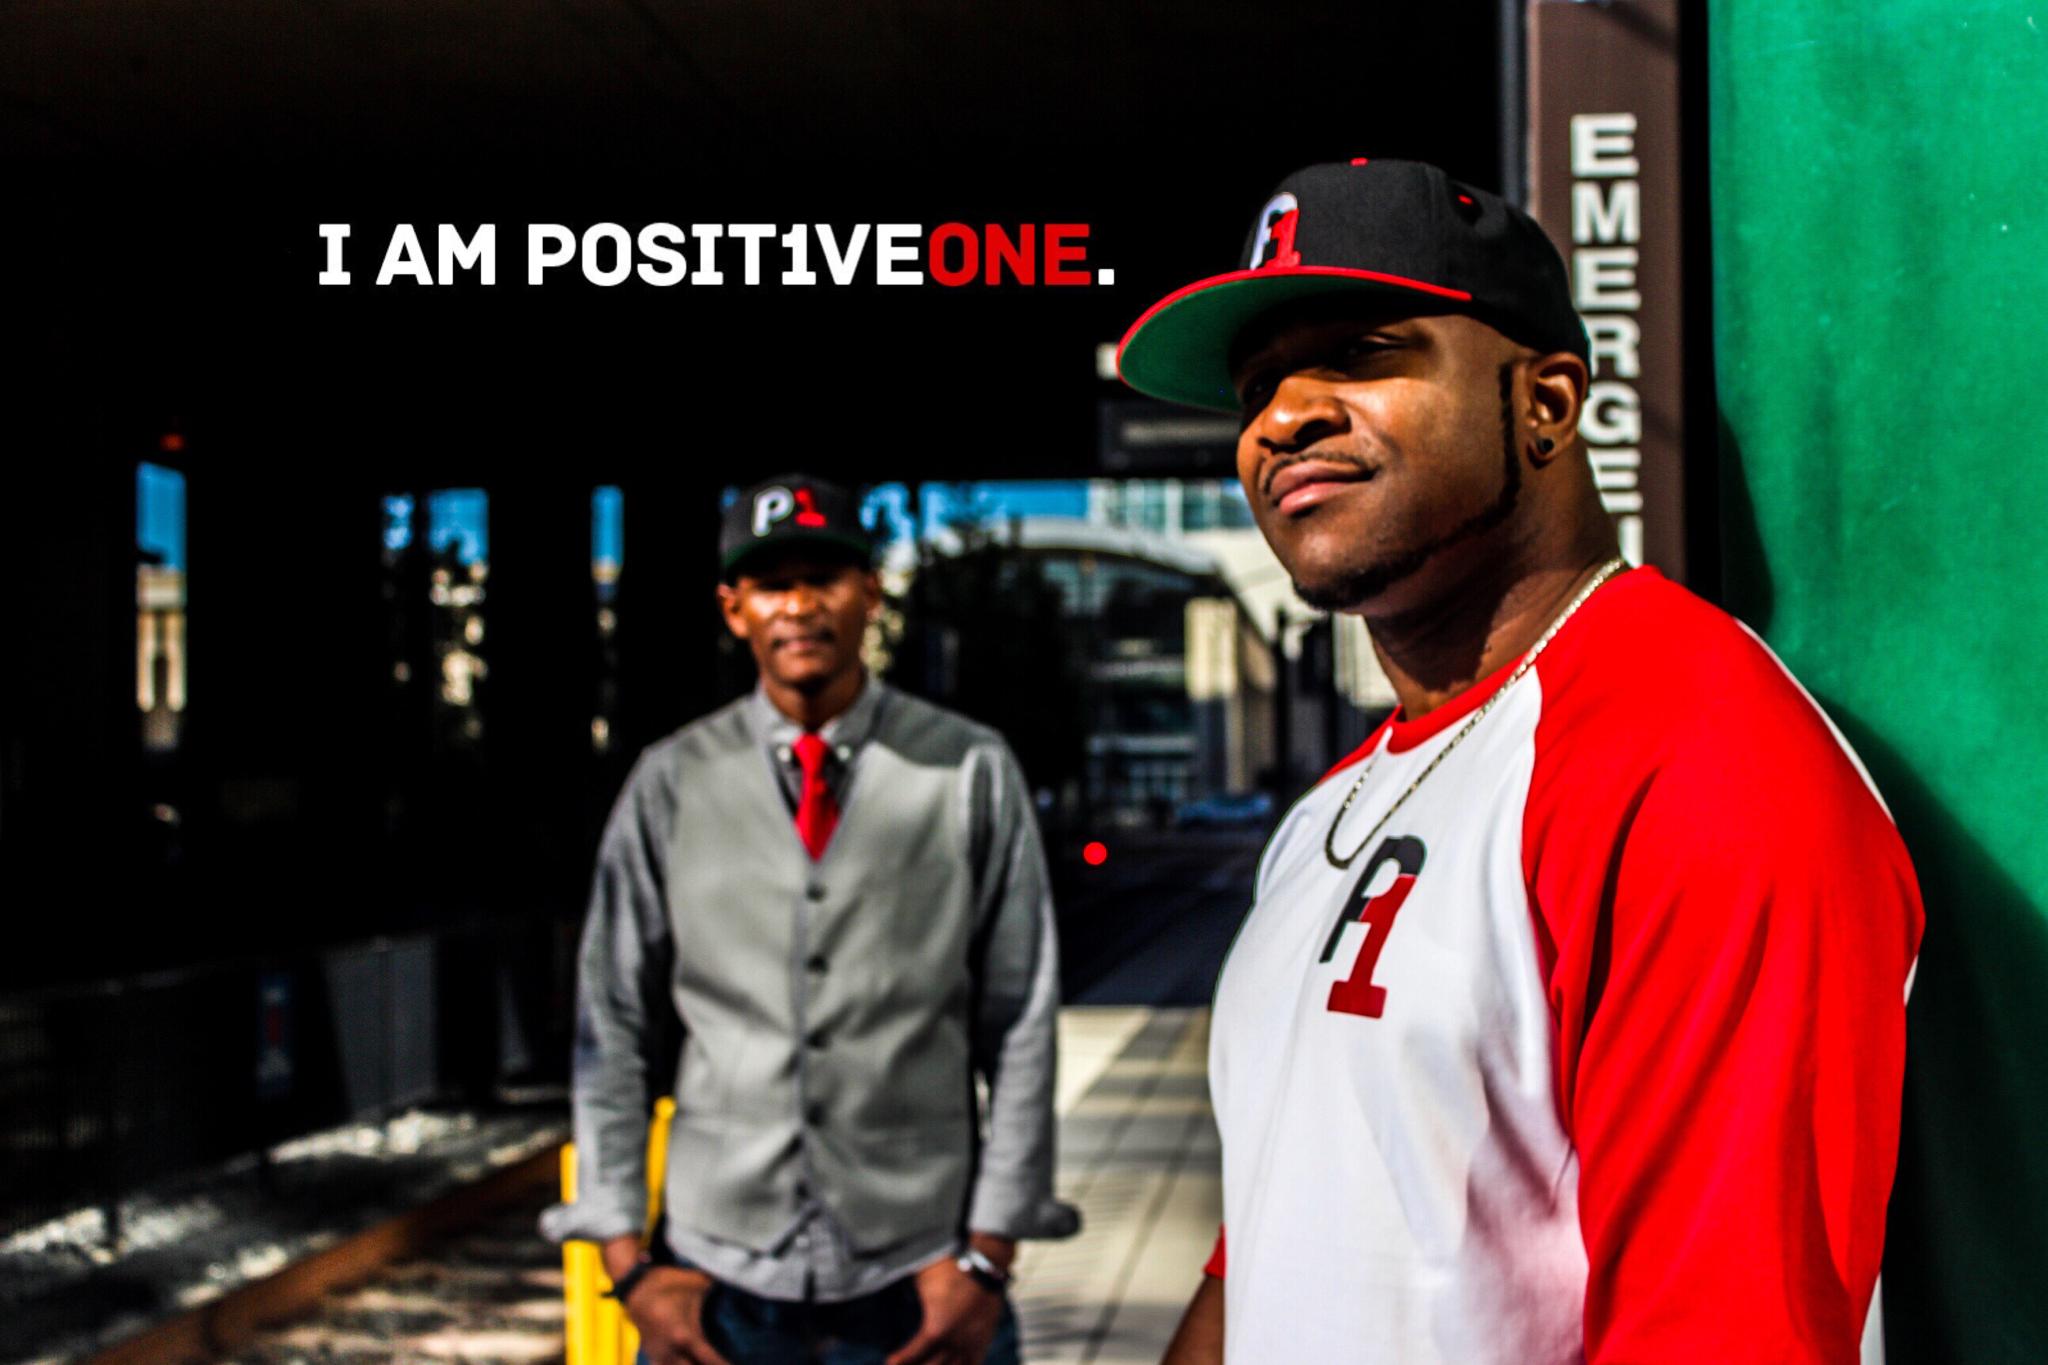 PositiveOne Motivational Speakers